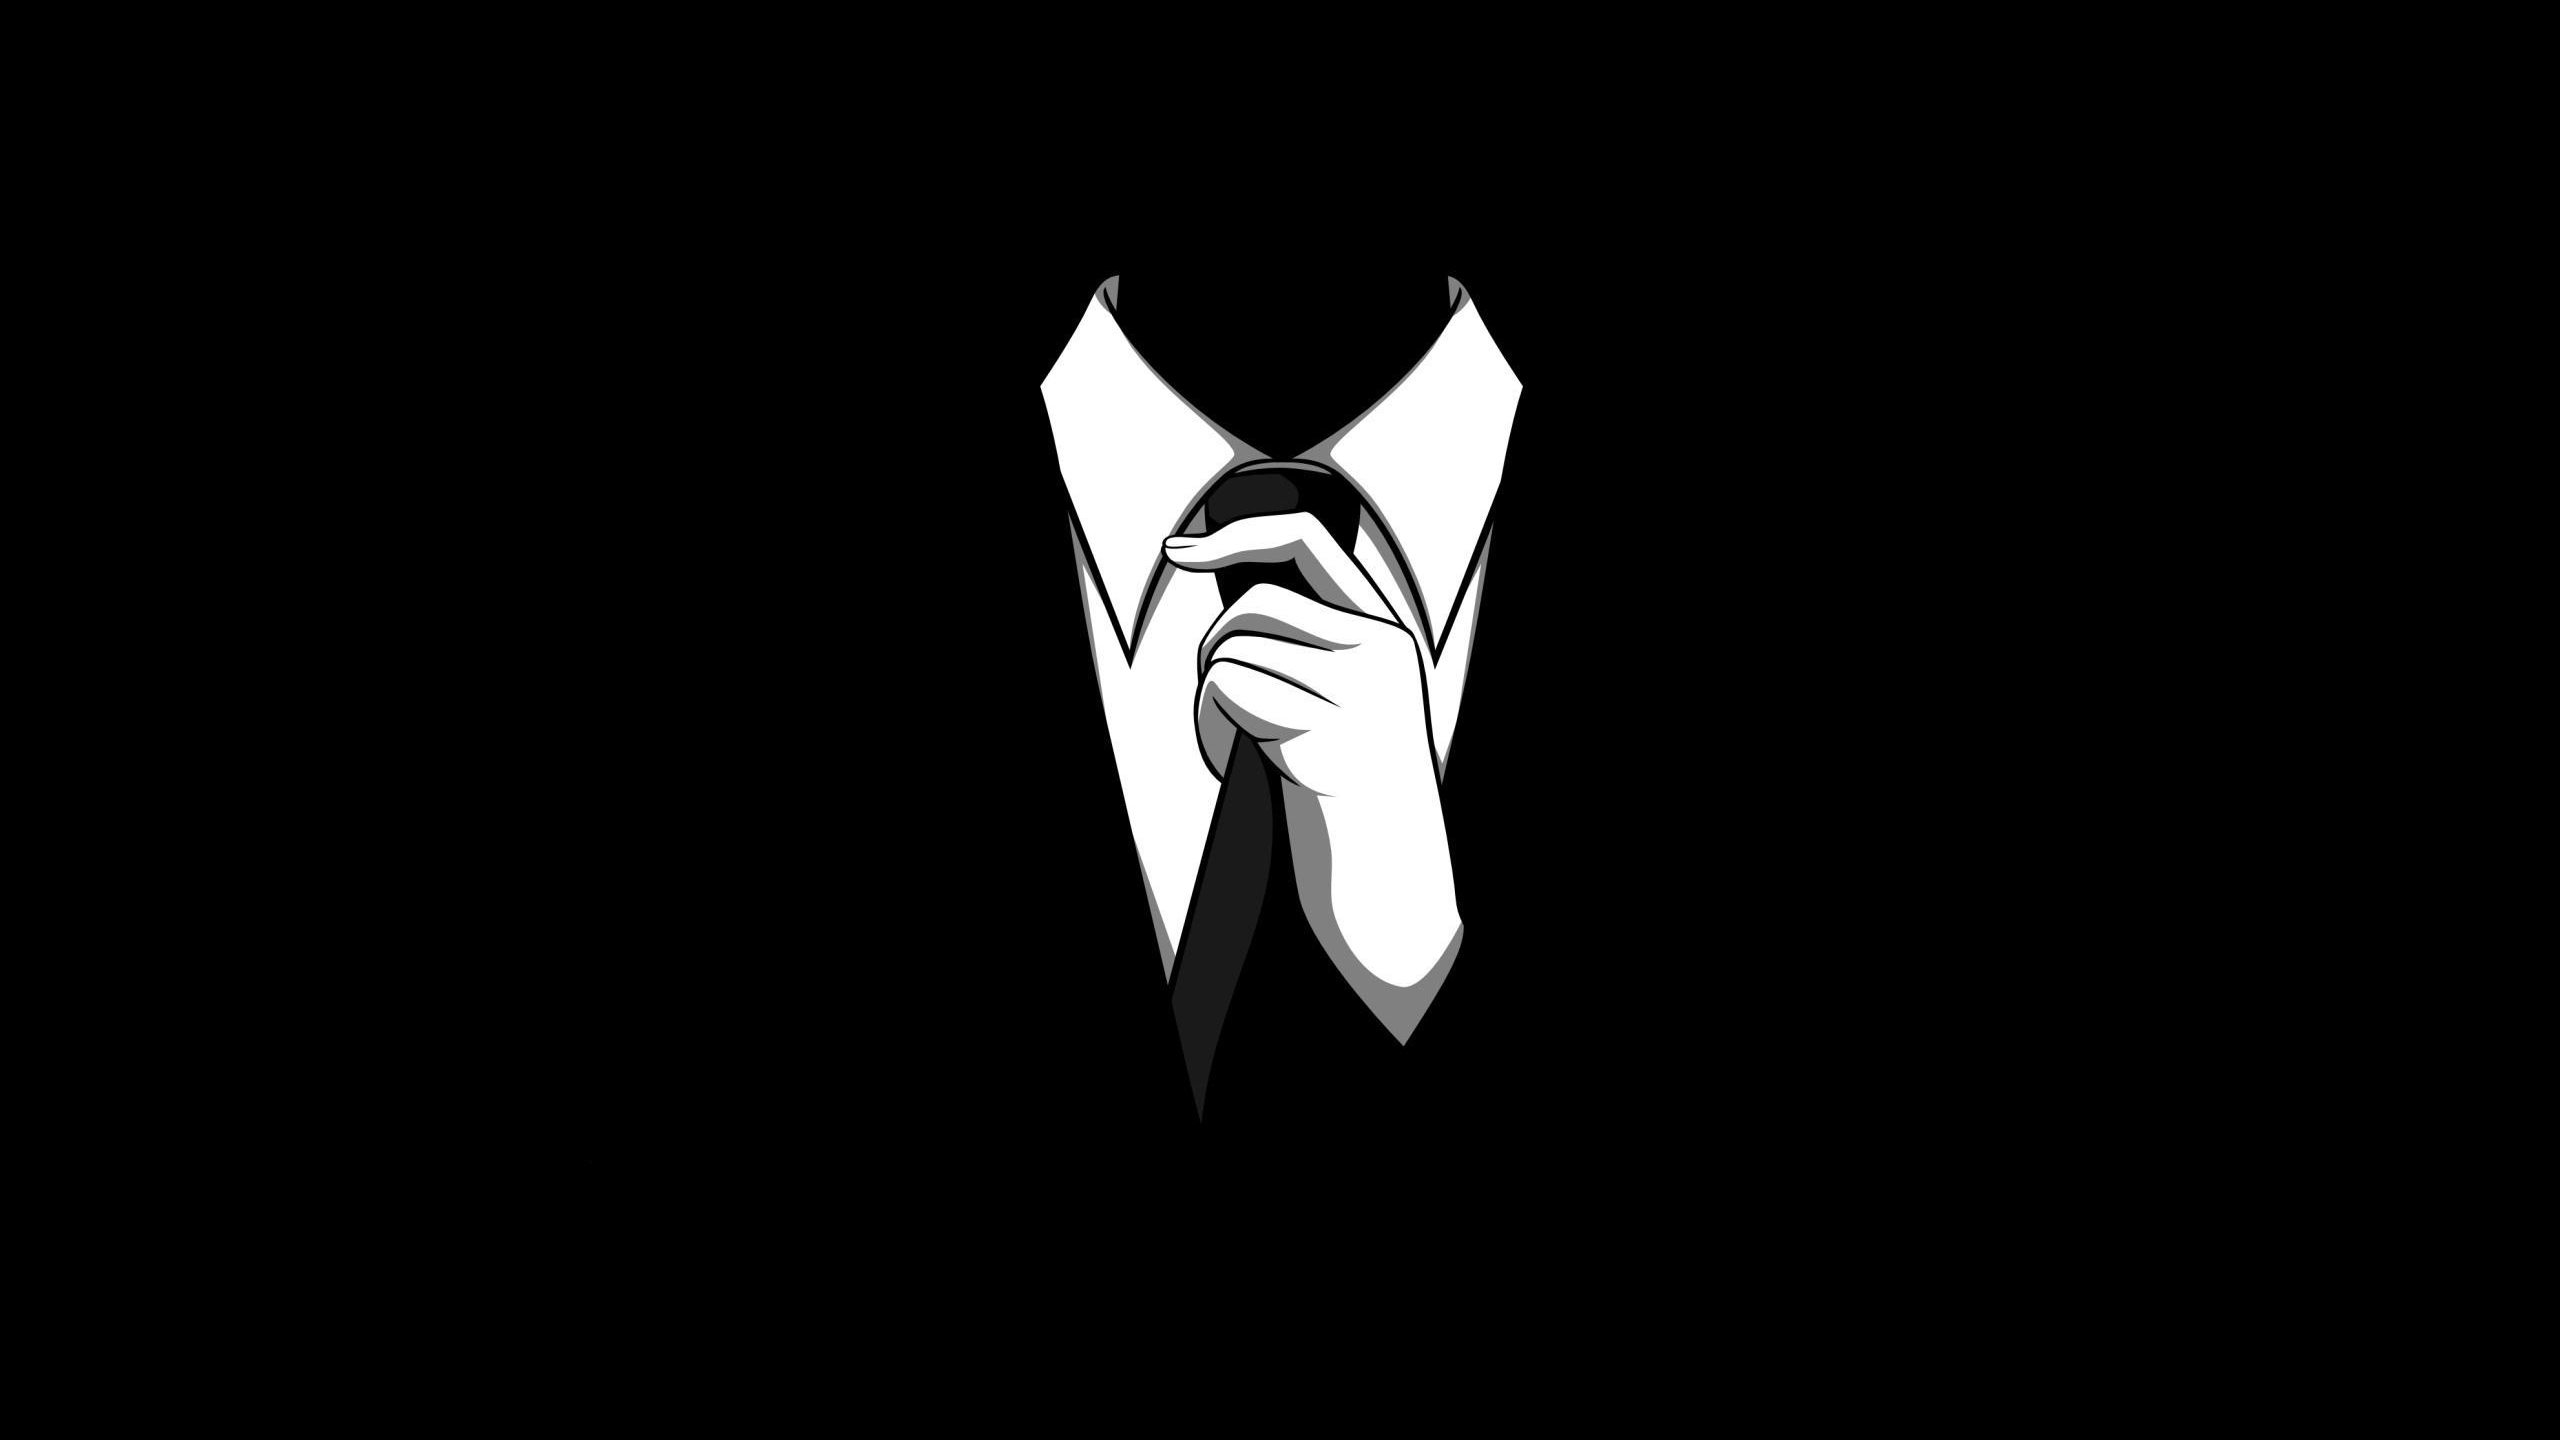 anonymous-black_00358152.jpg